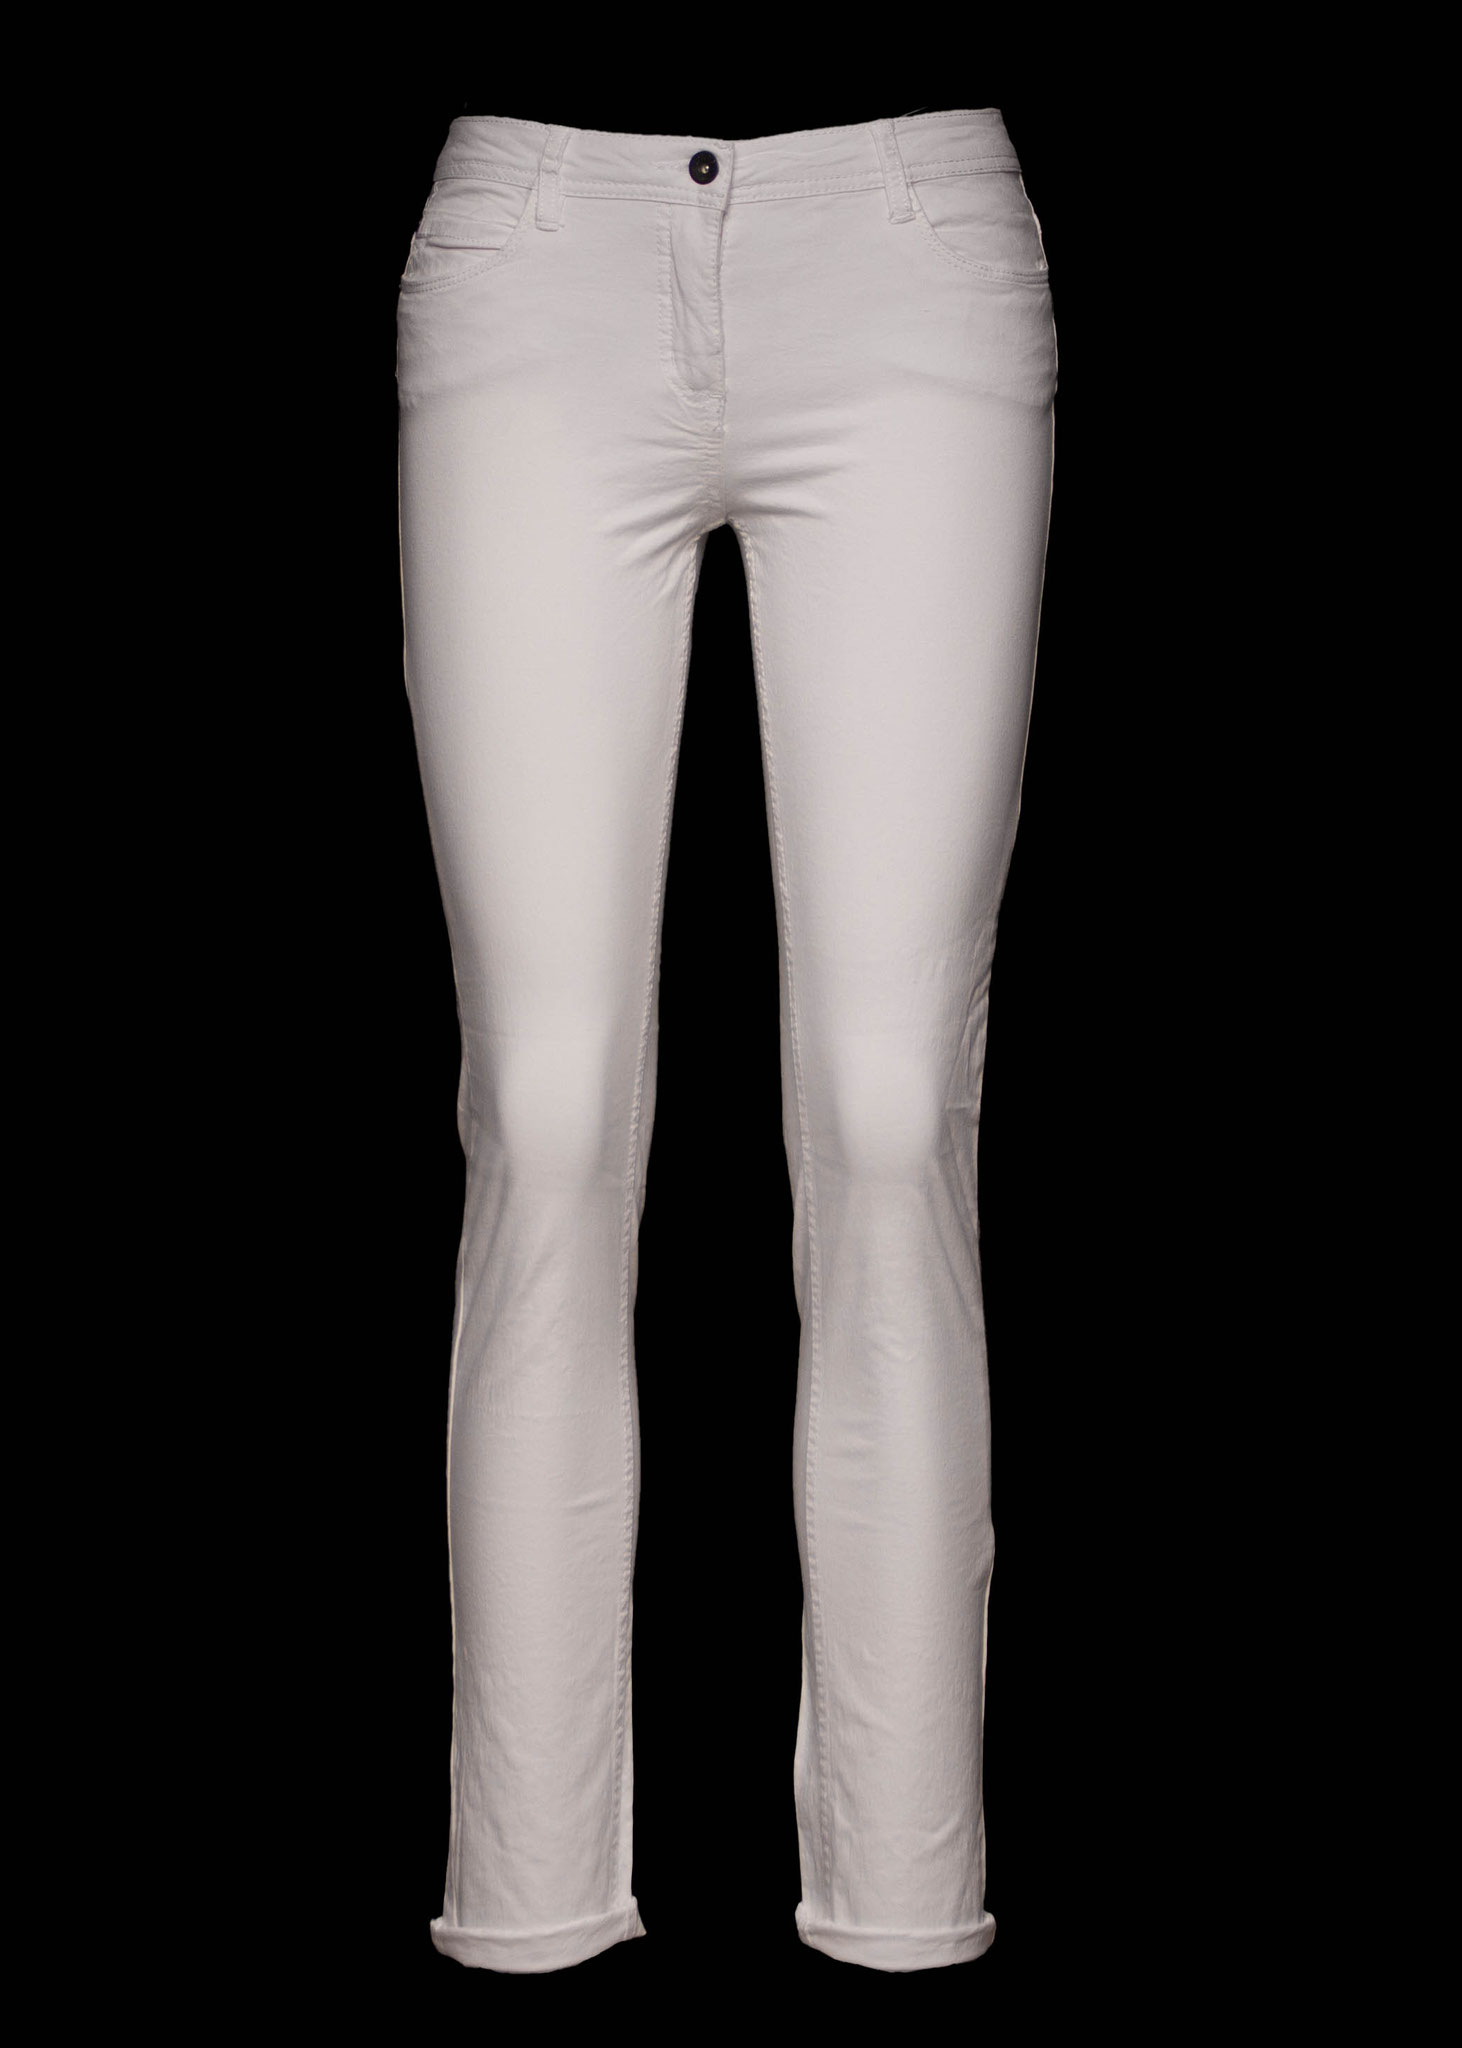 Gabardine Hose Weiß 29,99€